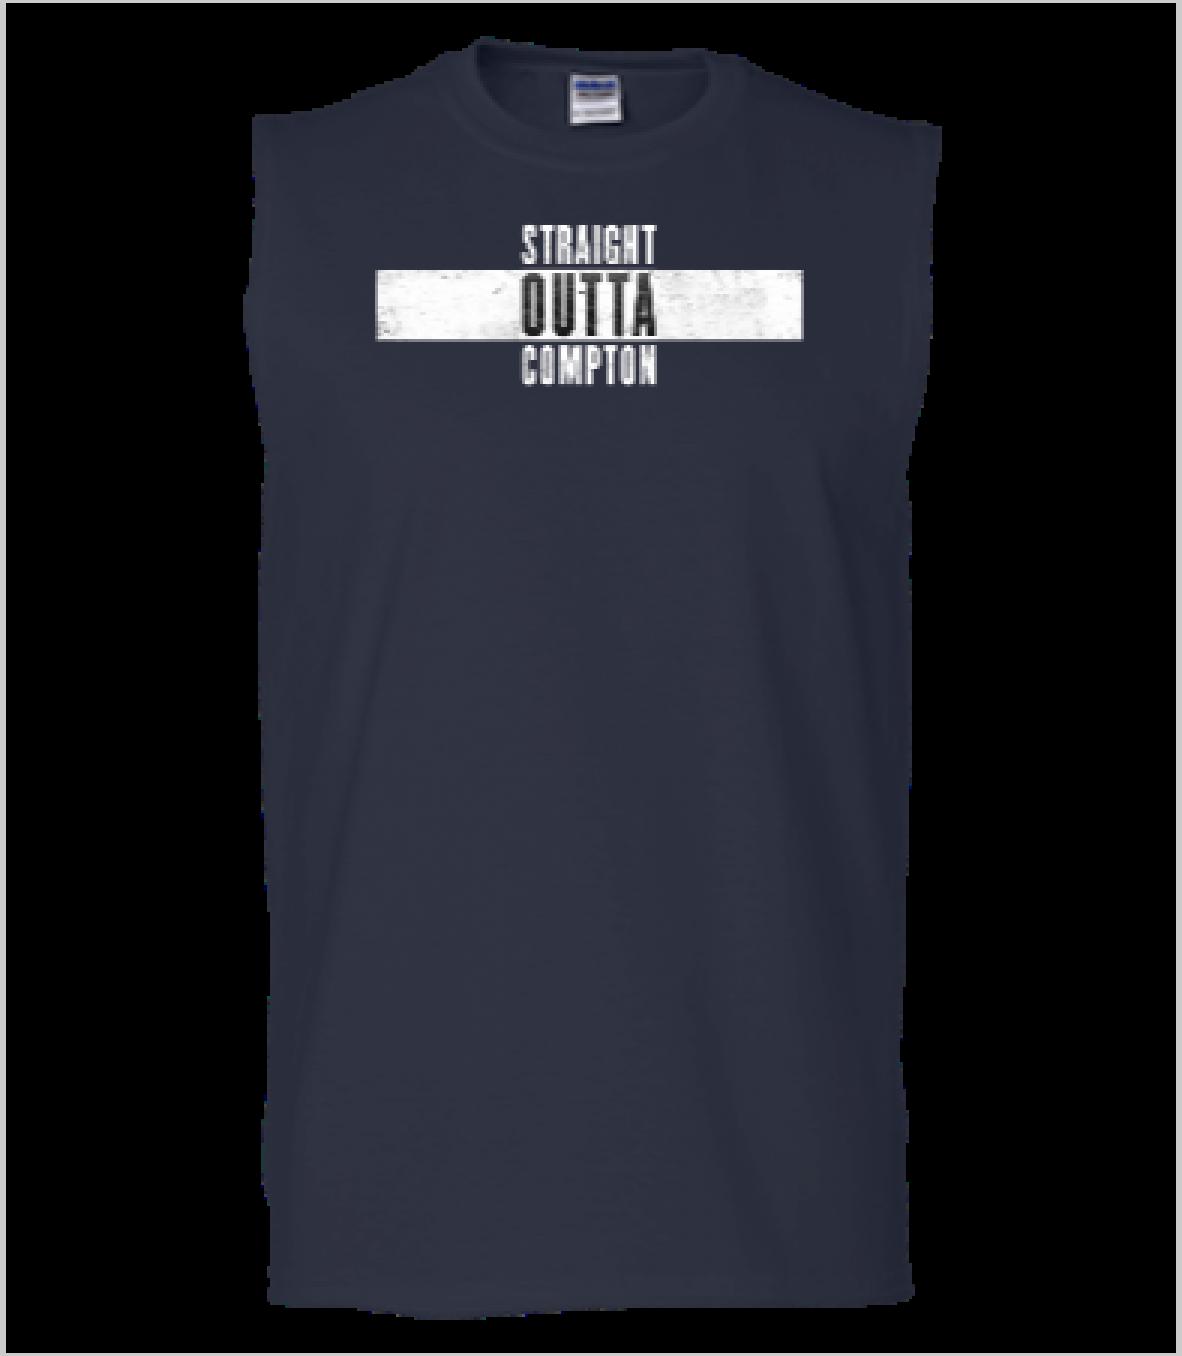 straight outta compton - Sleeveless T-shirt